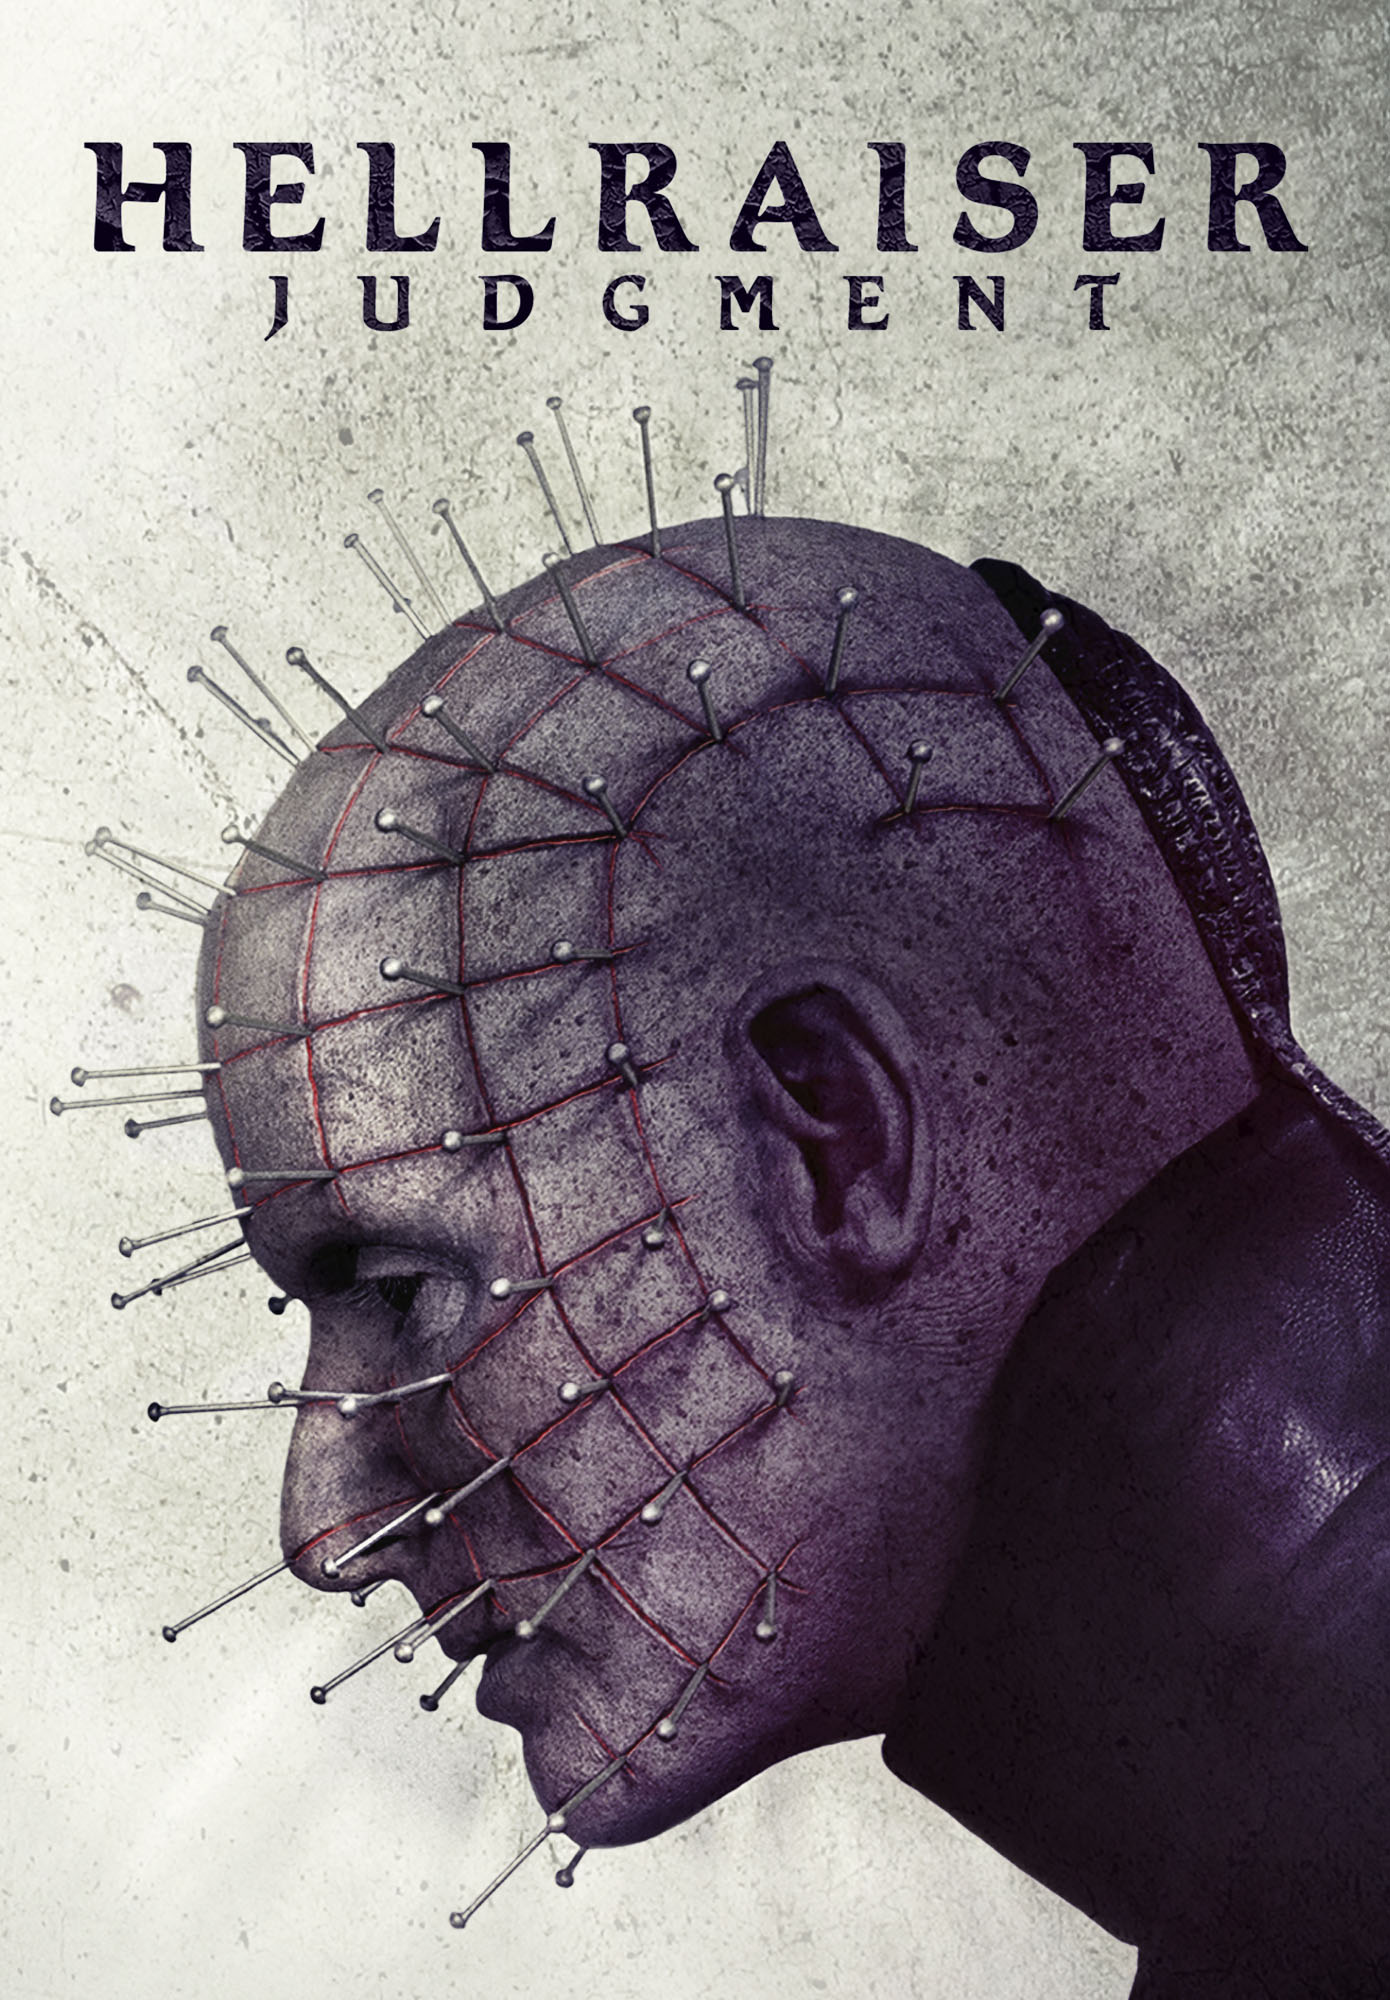 Hellraiser: Judgment (2018) BluRay 720p